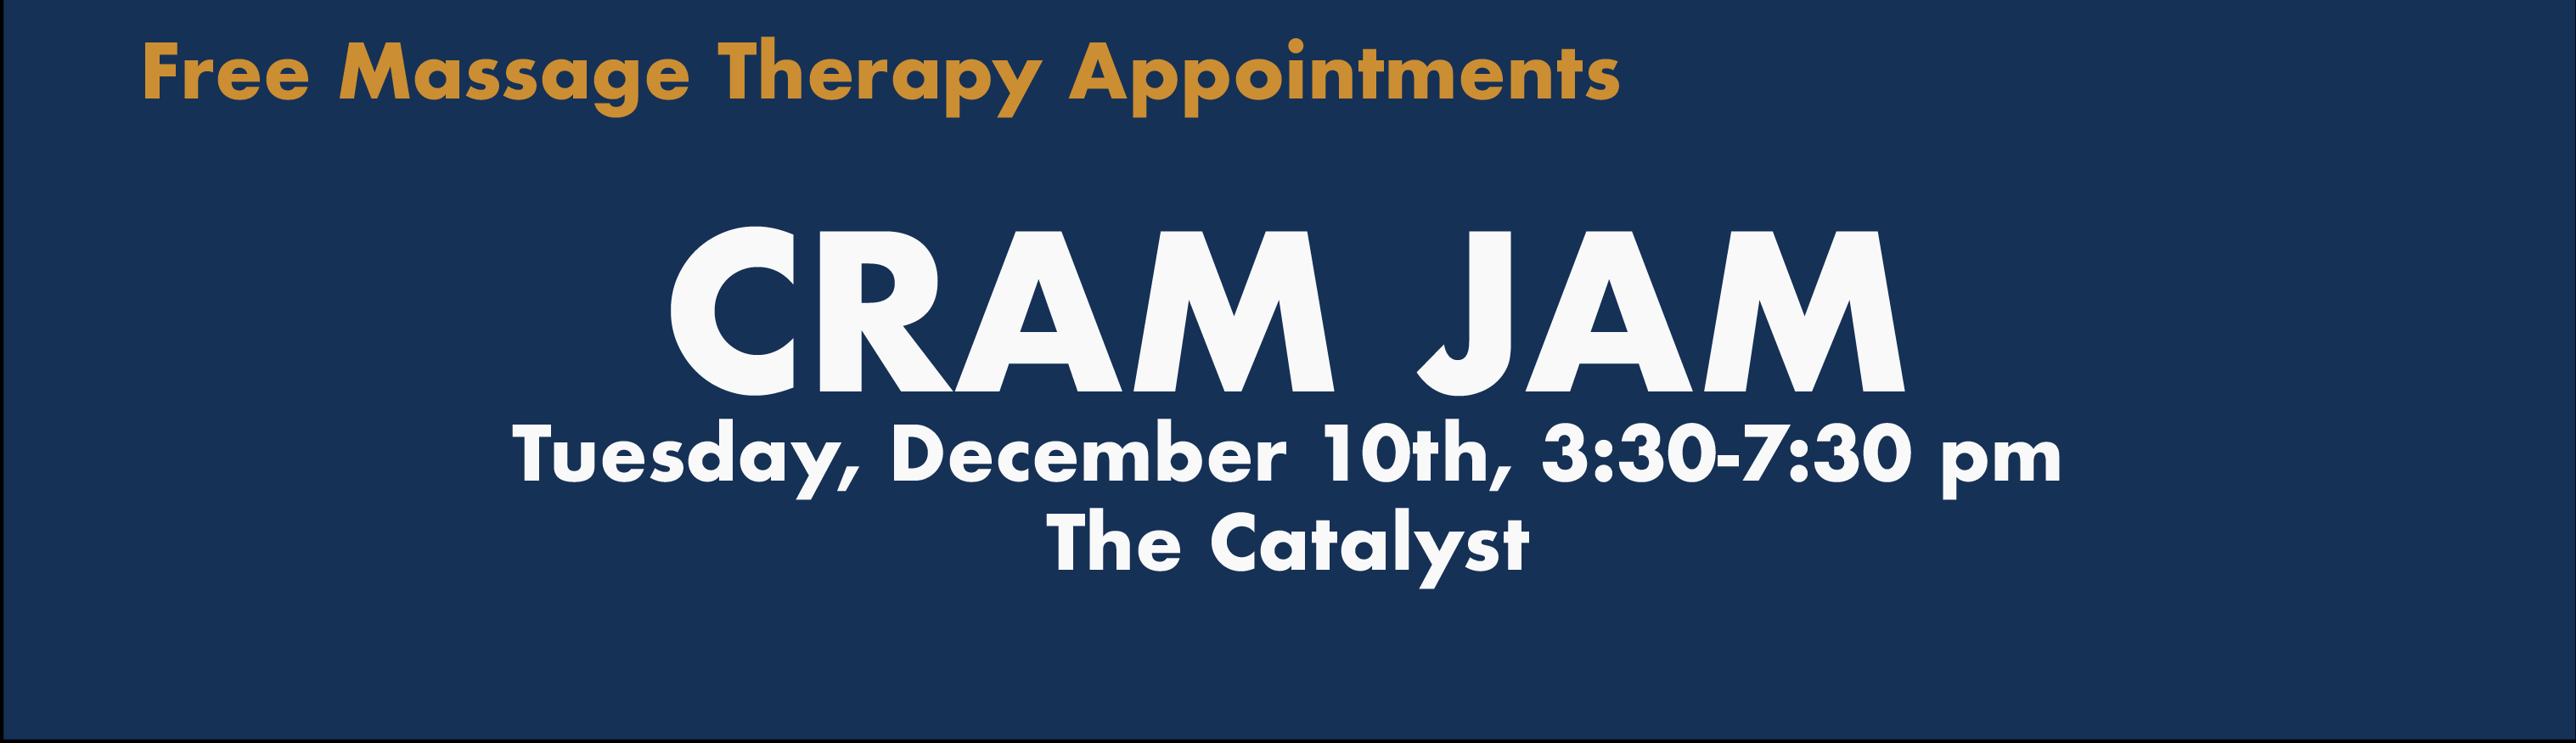 Cram-Jam-2019.png